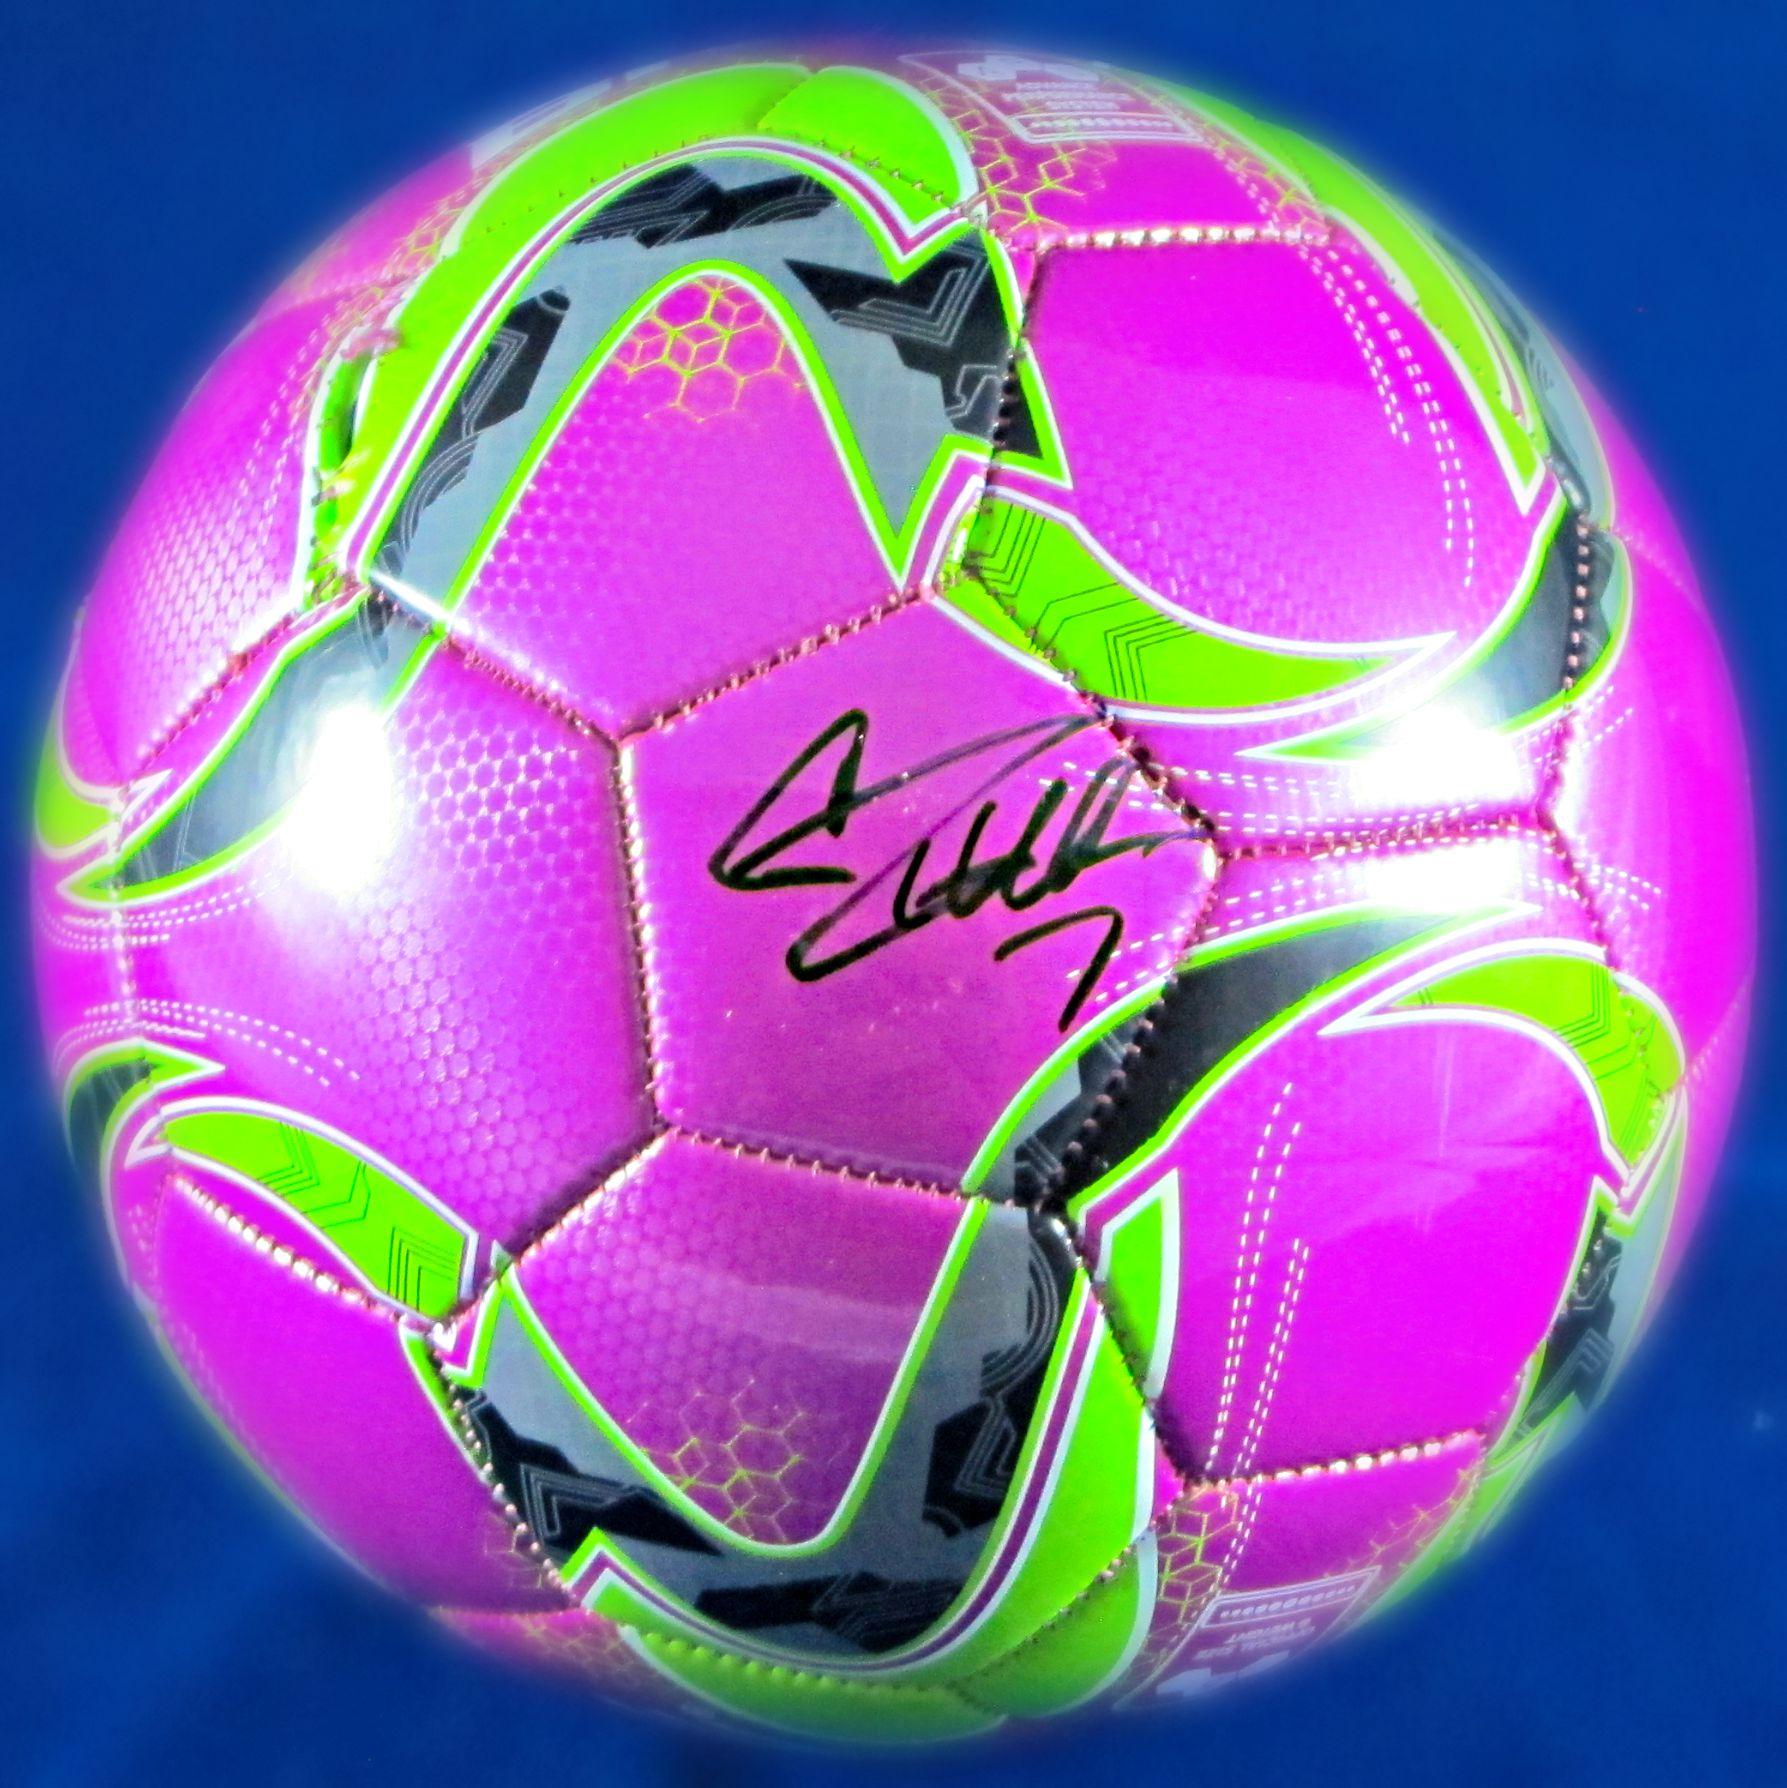 46b1b748164 Cristiano Ronaldo signed soccer ball - Memorabilia Center